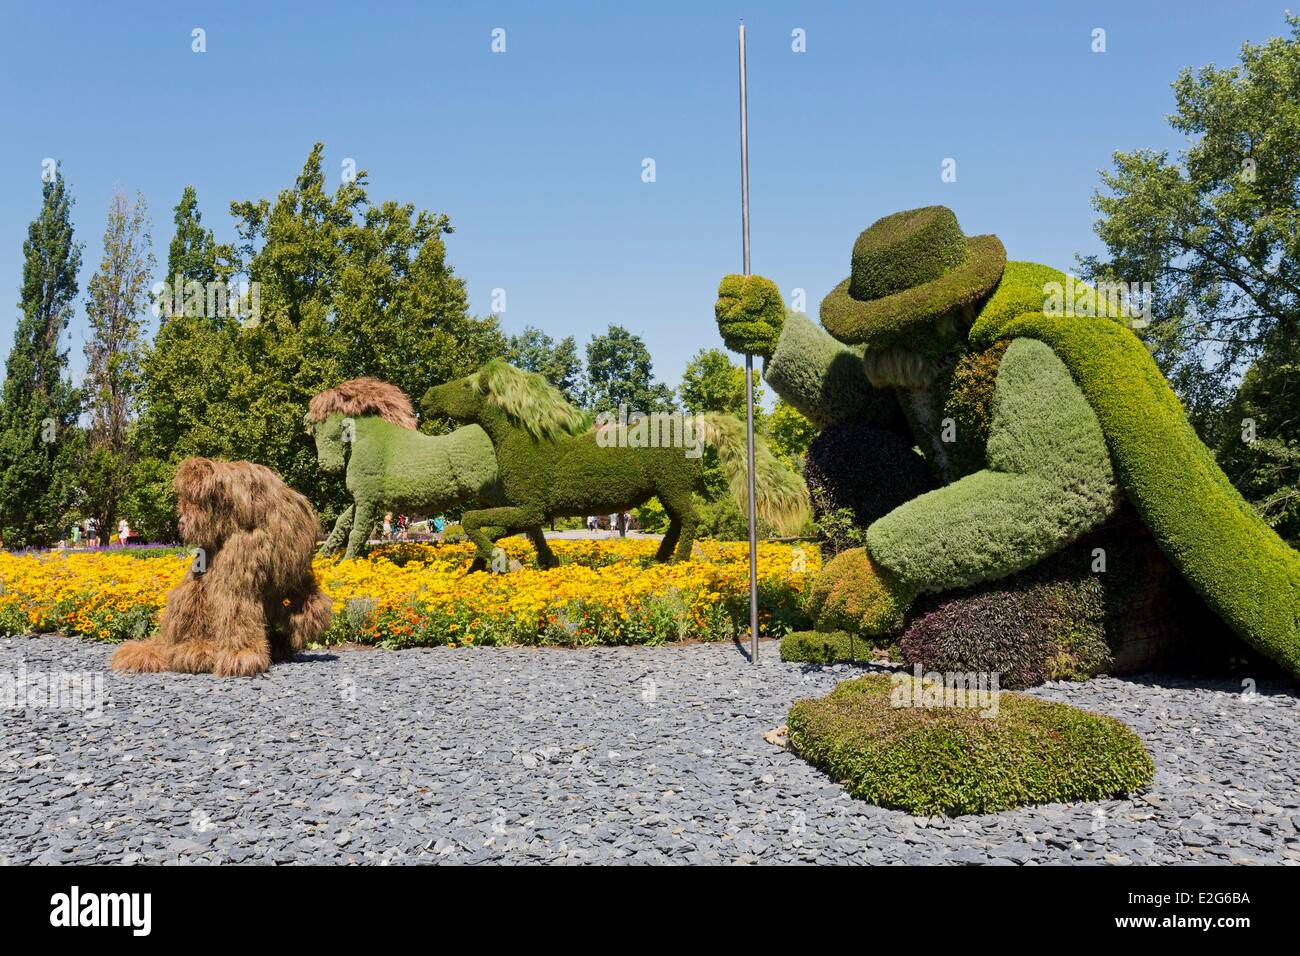 Canada Quebec Province Montreal The Botanical Garden The Man